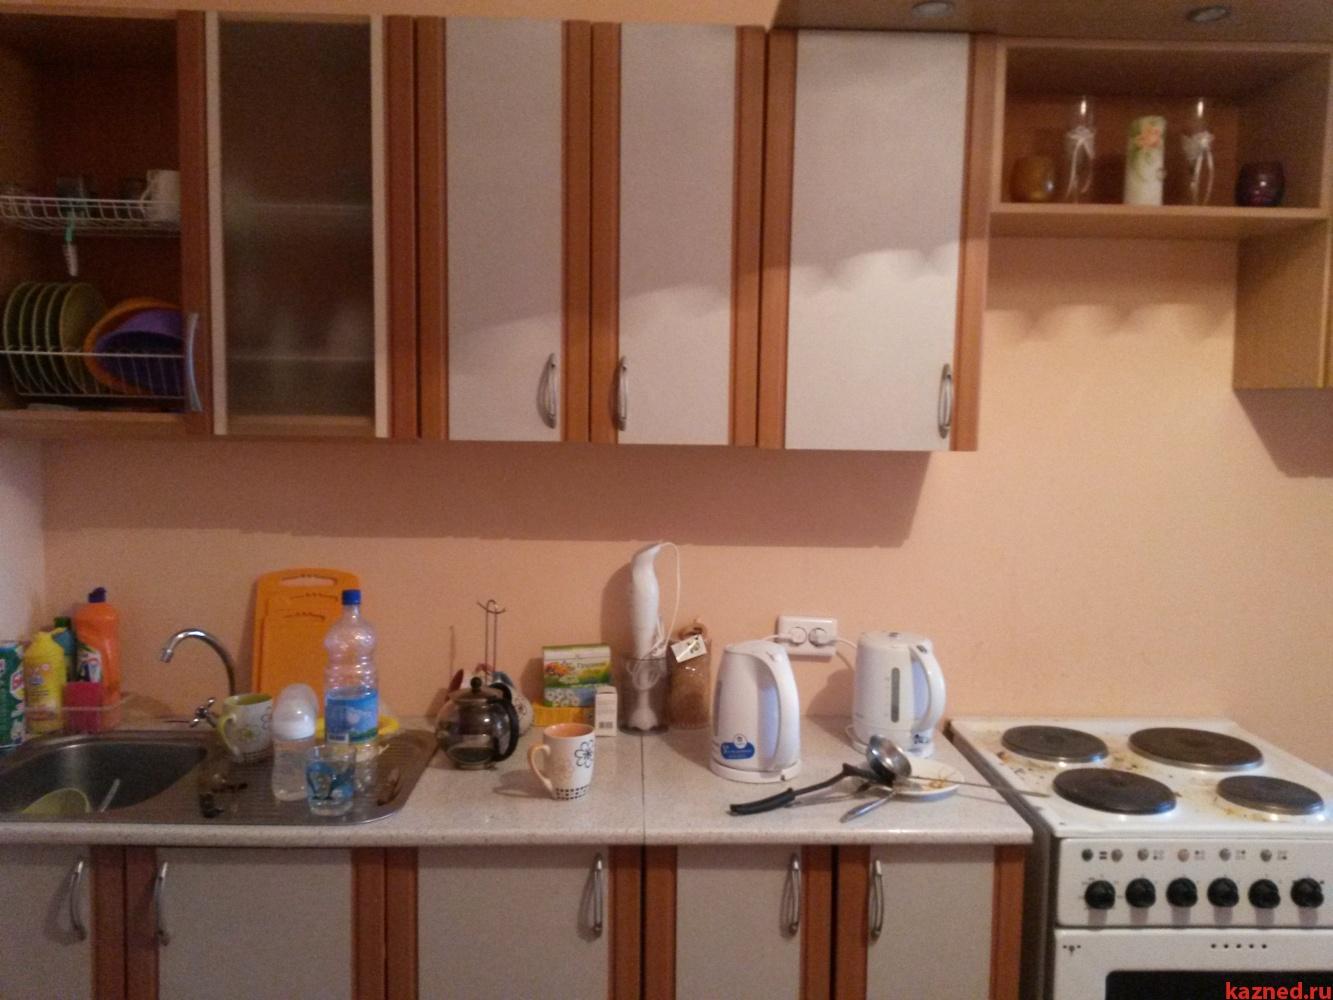 Продажа 1-к квартиры Ю.Фучика, 14В, 46 м2  (миниатюра №6)